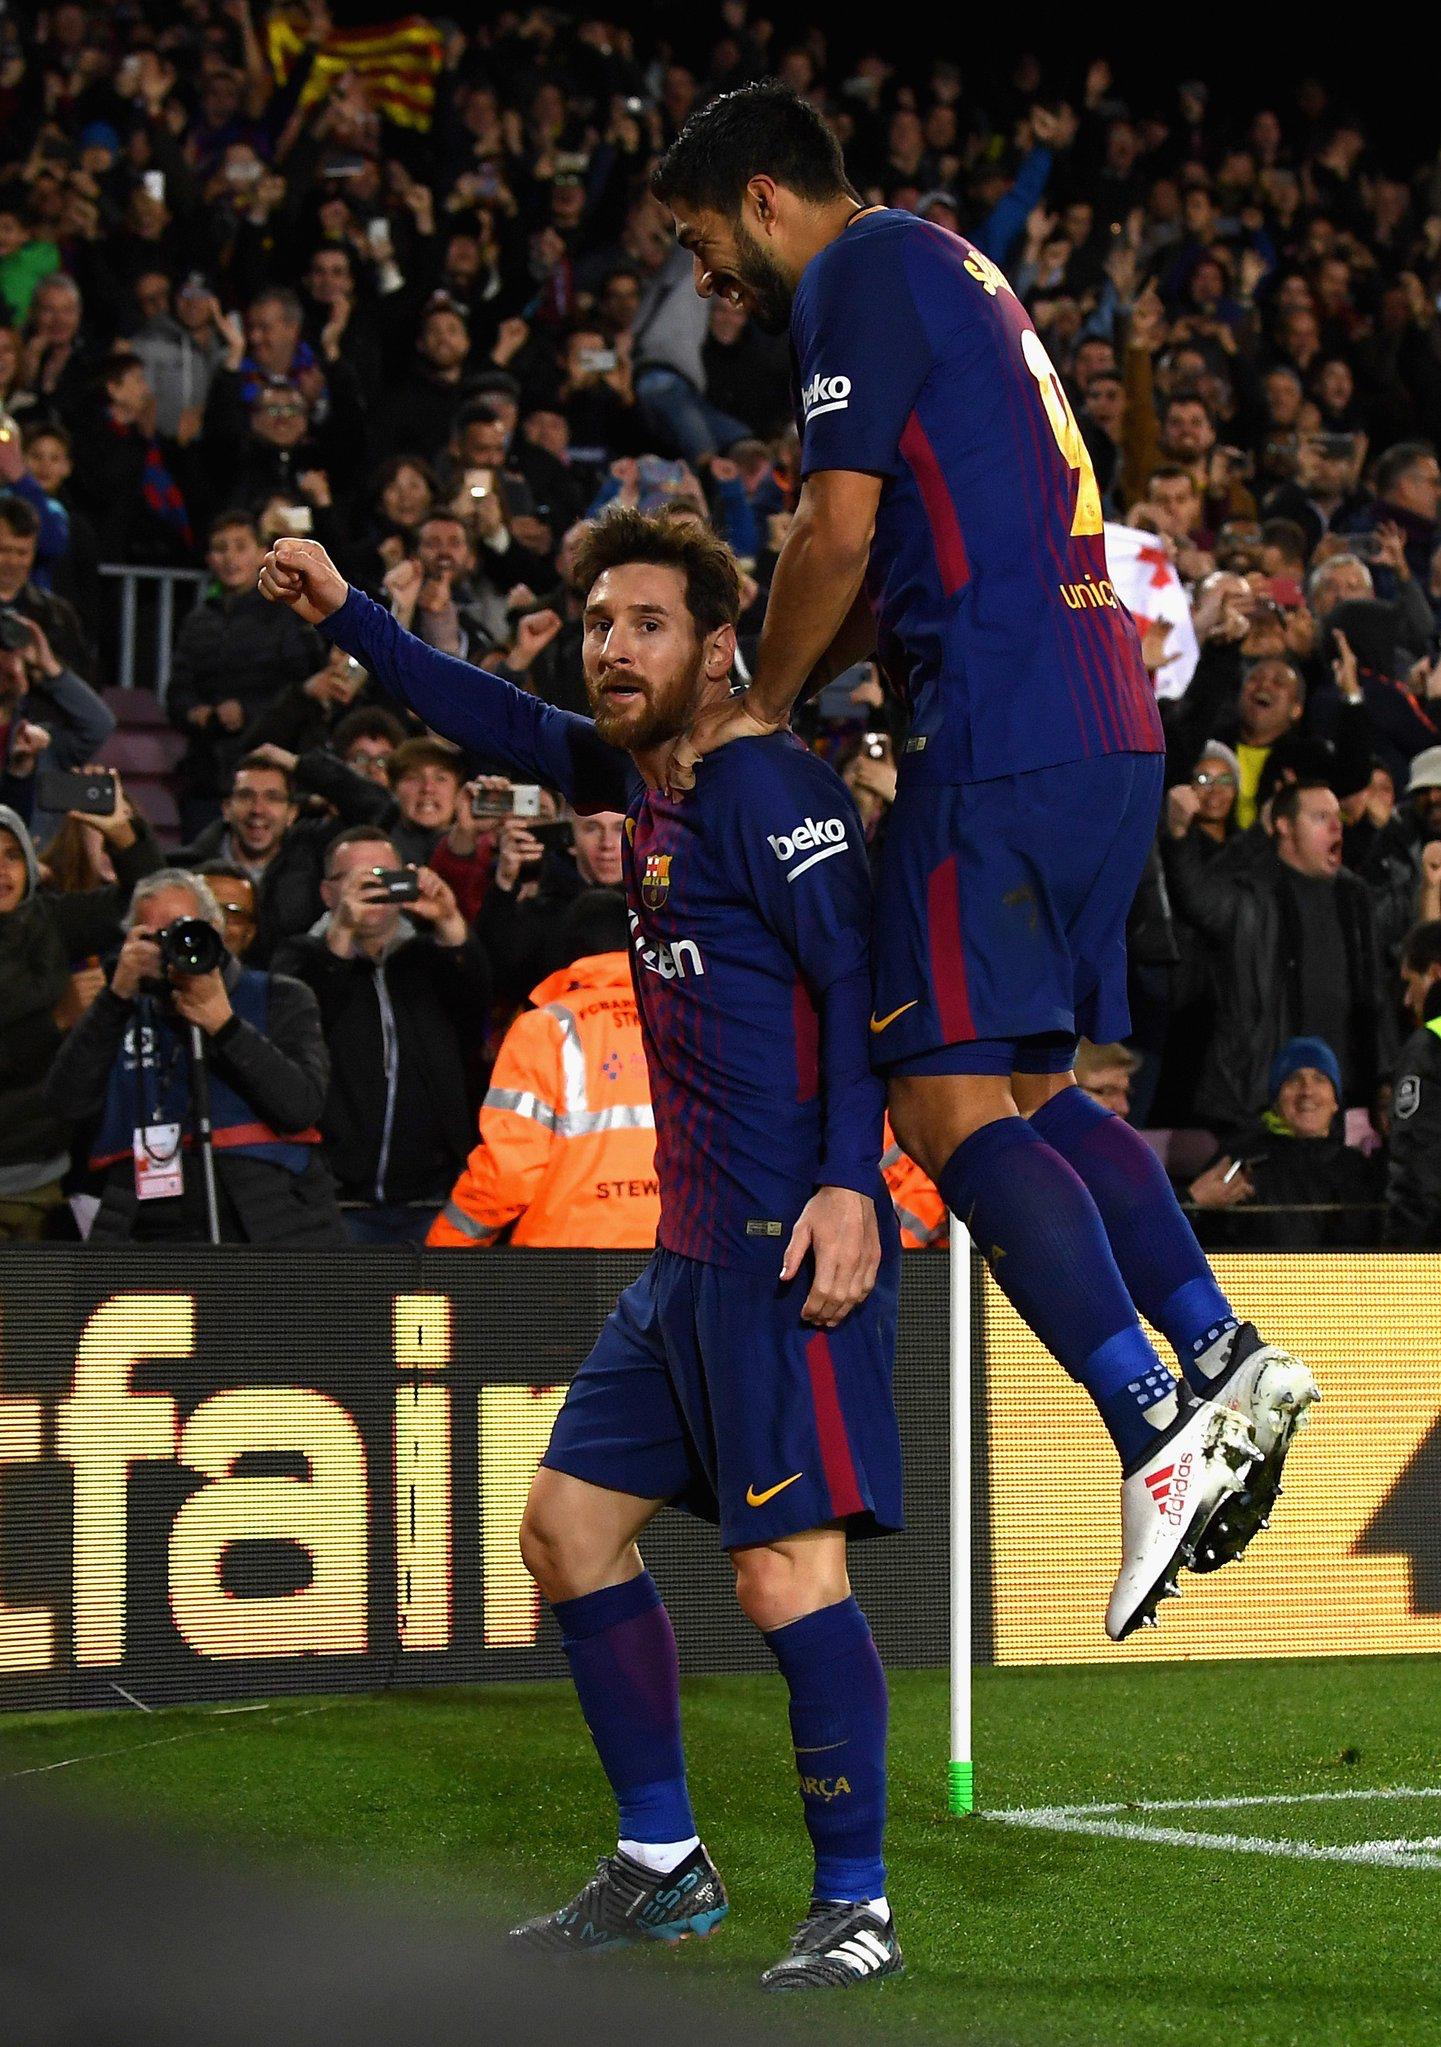 Messi Y Suarez 스포츠 온라인 카지노